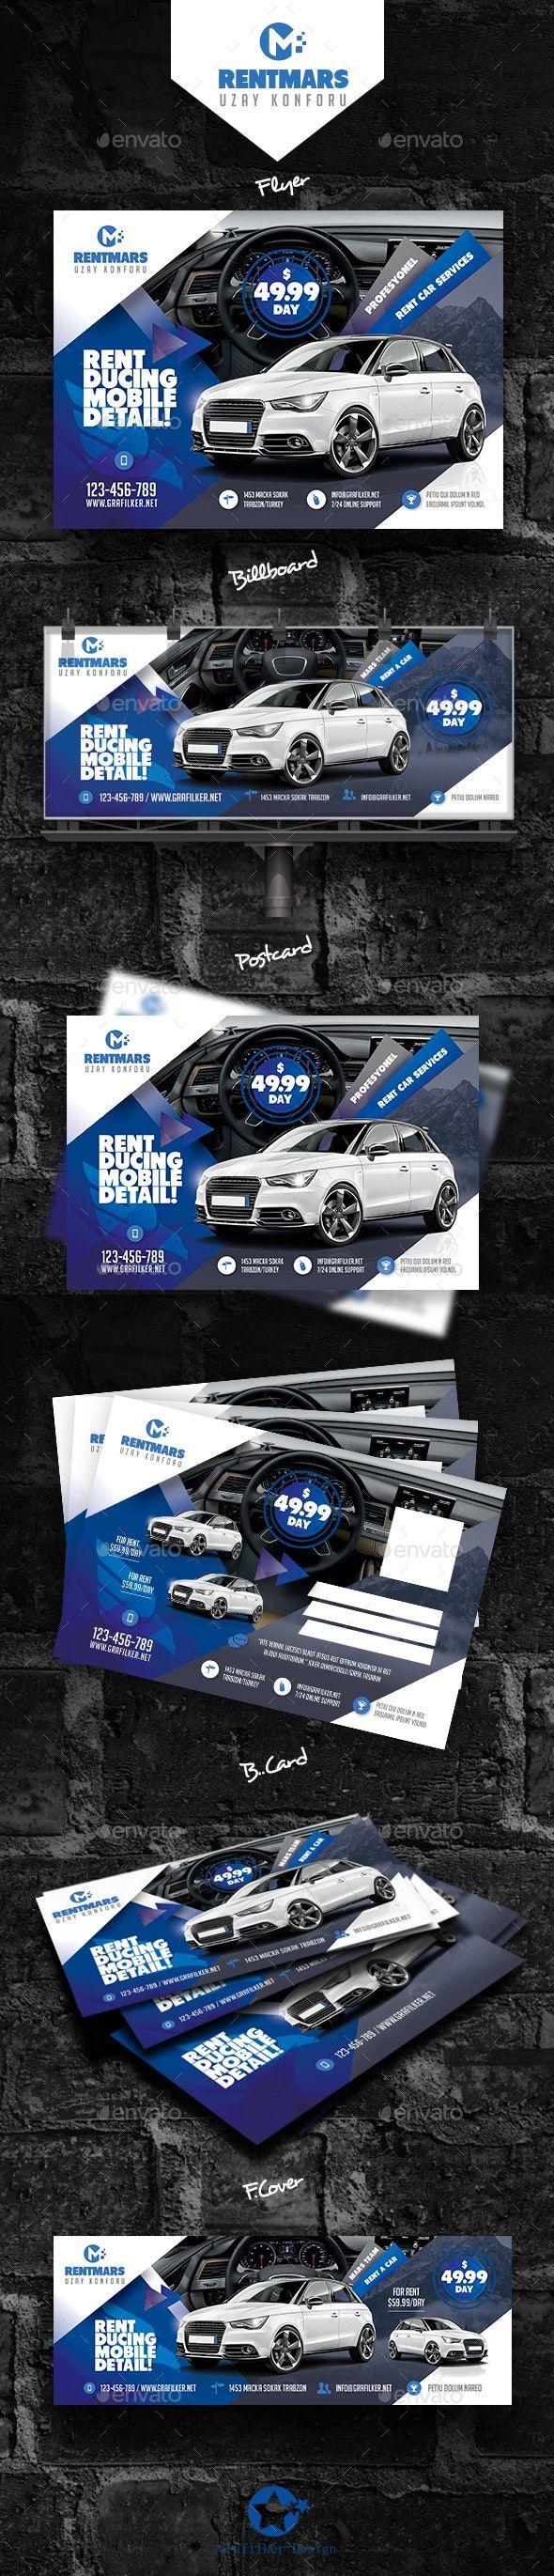 Rent A Car Bundle Templates AD Car, Sponsored, Rent,